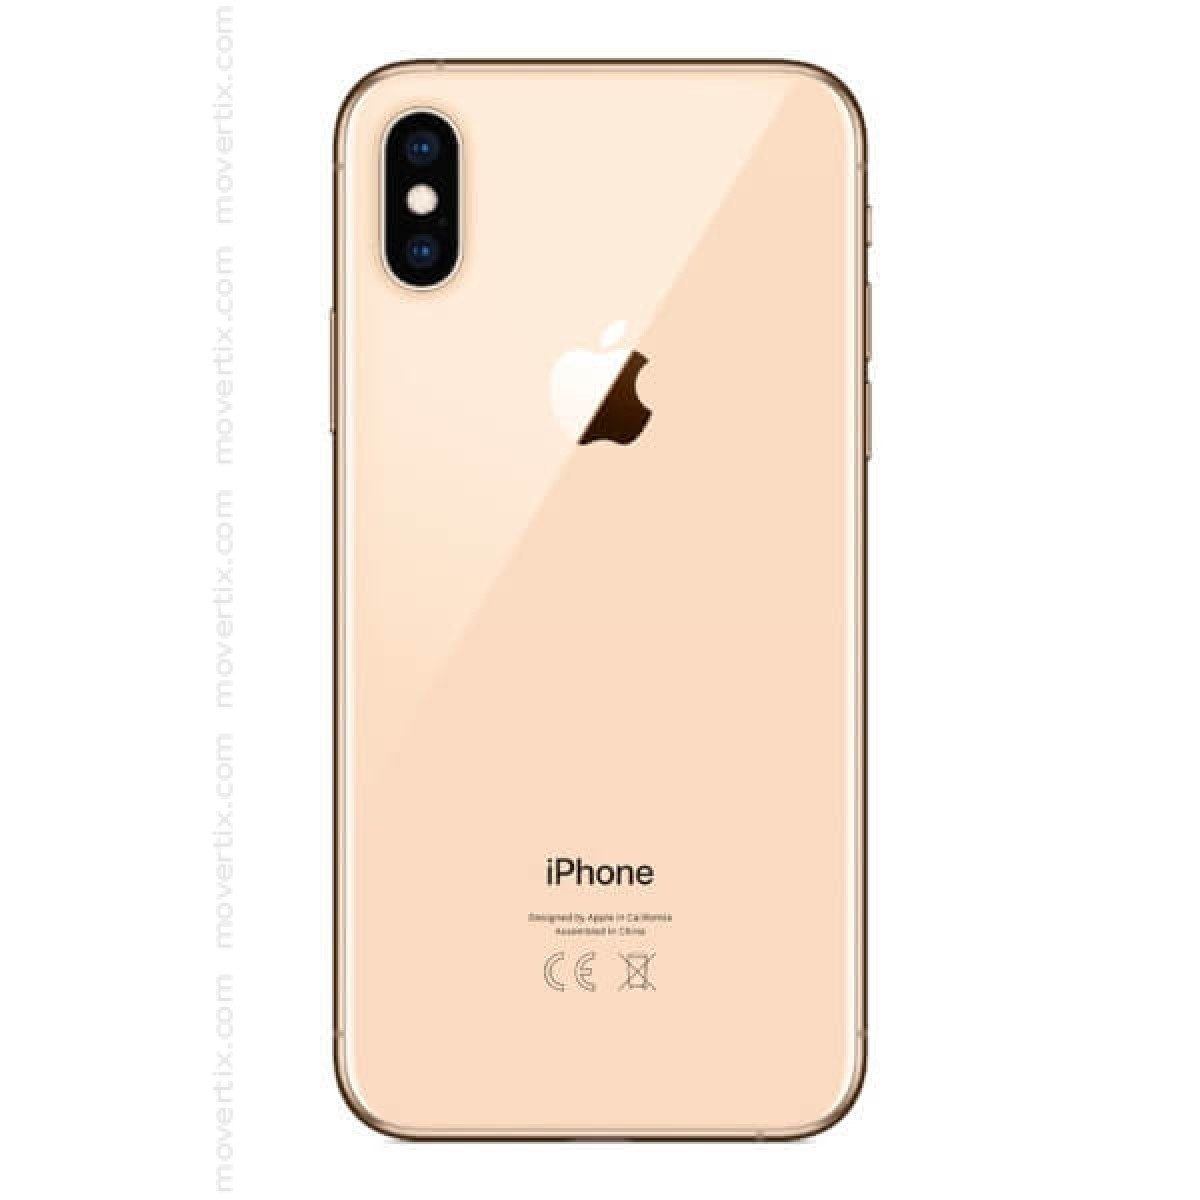 dd34b76bfb3 Apple iPhone XS Dourado de 64GB (0190198791641) | Movertix Loja de  Telemóveis